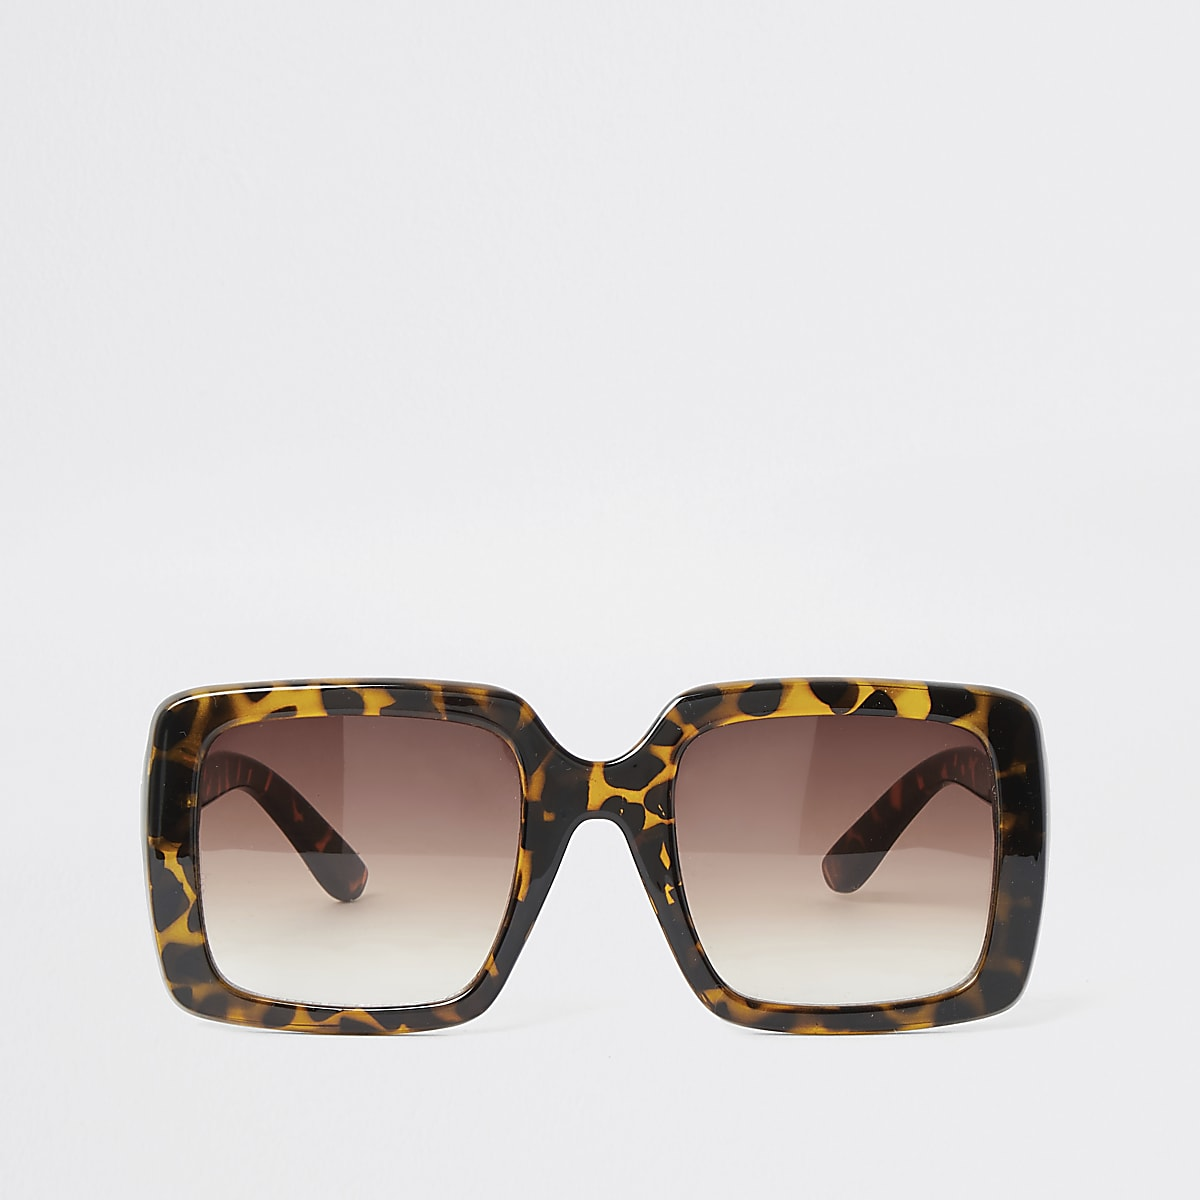 Bruine tortoise glamoureuze zonnebril